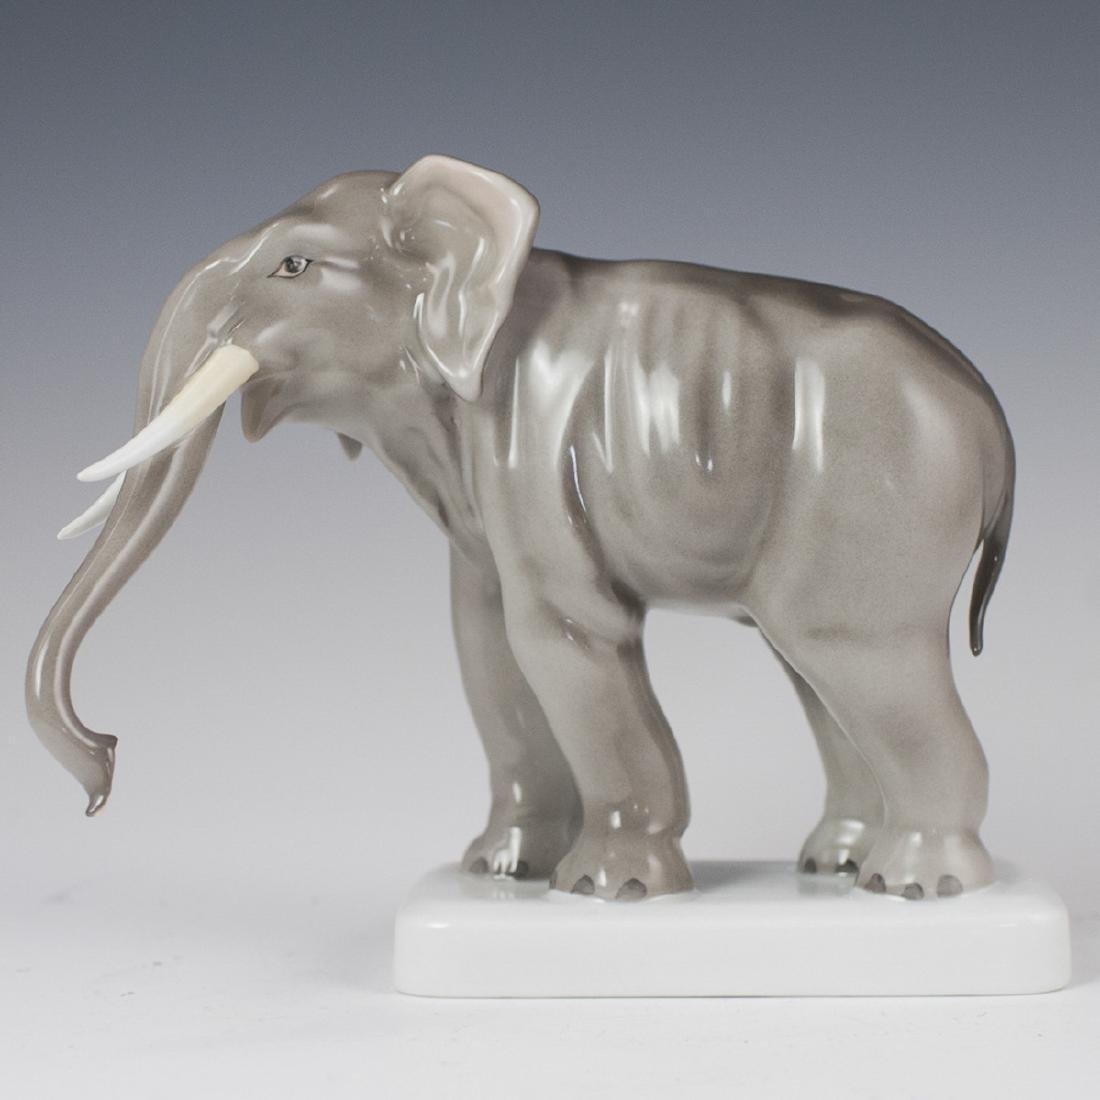 Herend Porcelain Elephant Figurine